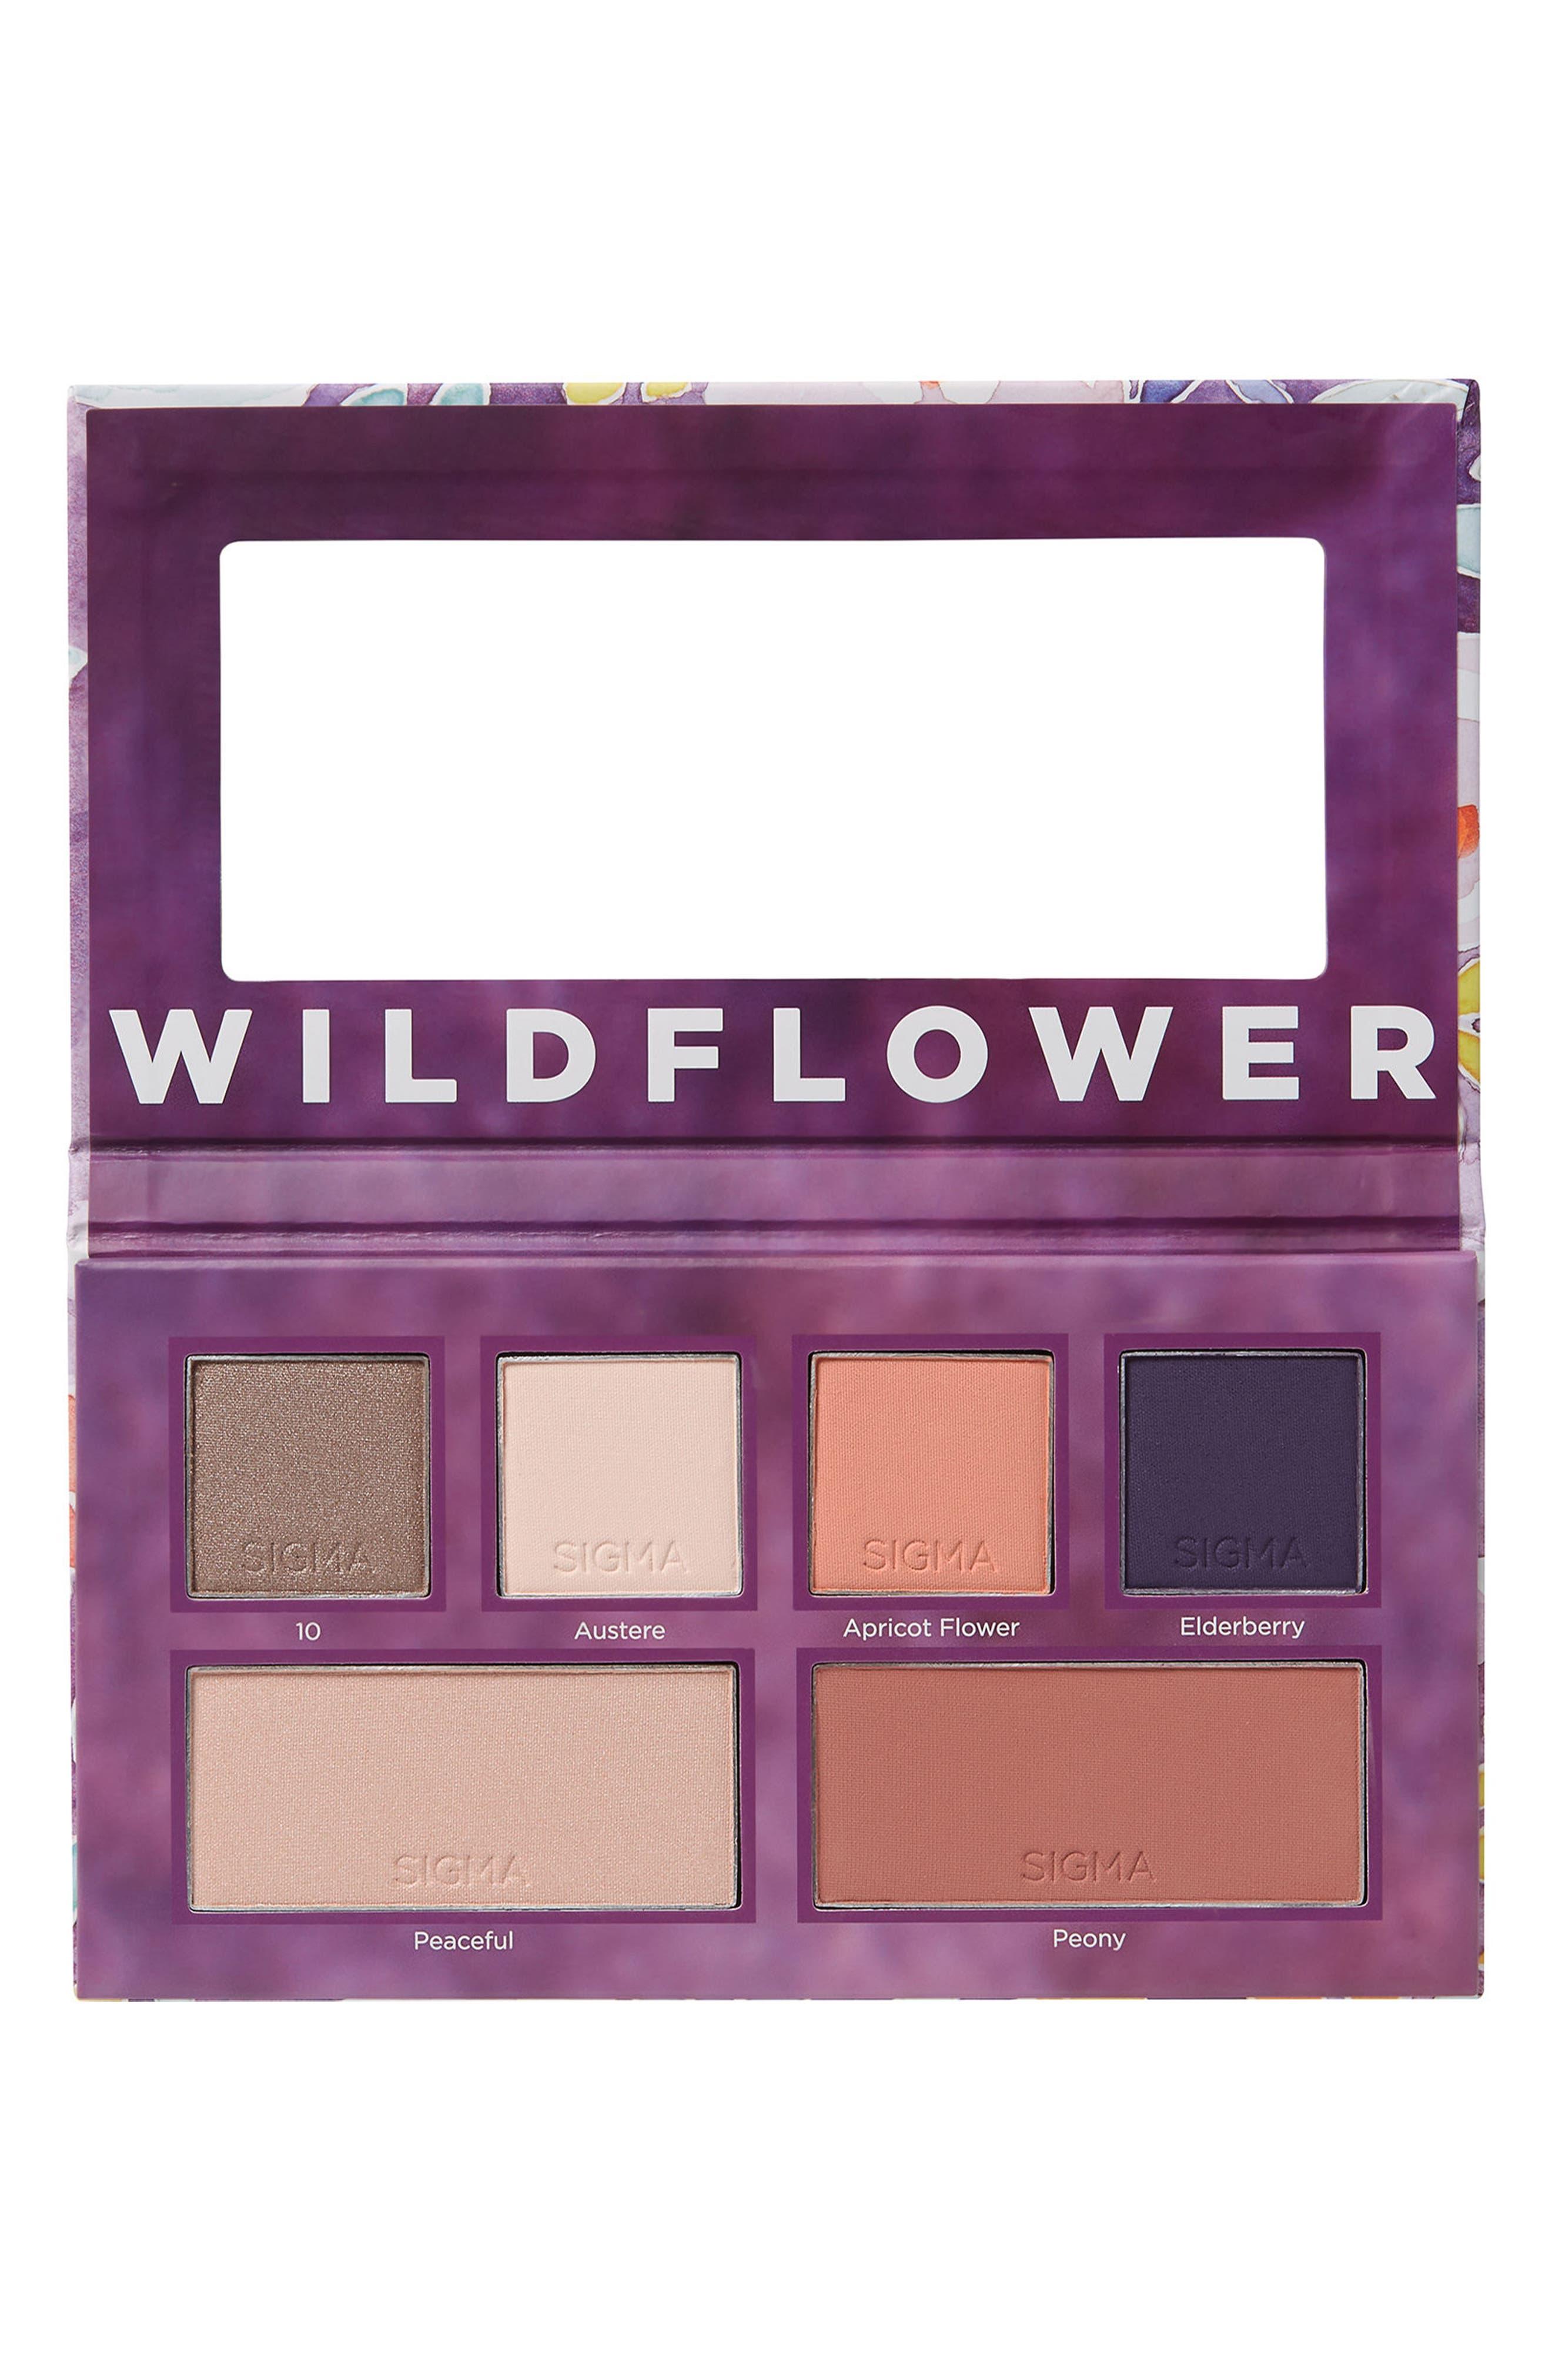 Wildflower Eye & Cheek Palette,                         Main,                         color, No Color